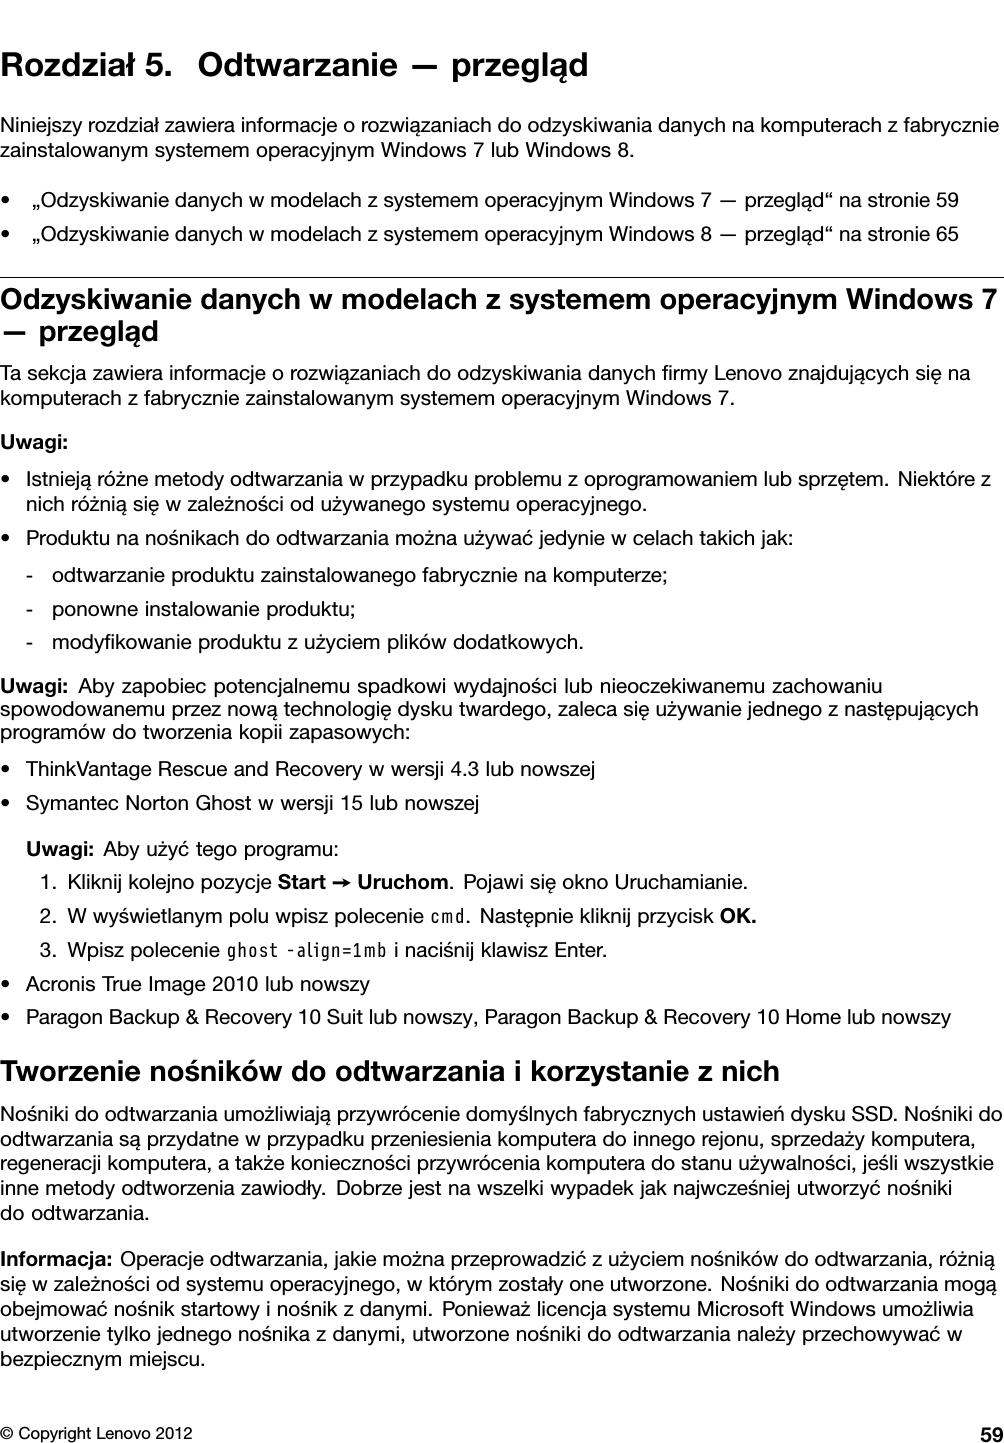 Lenovo X1Carbon Ug Pl User Manual (Polish) Guide Think Pad X1 Carbon